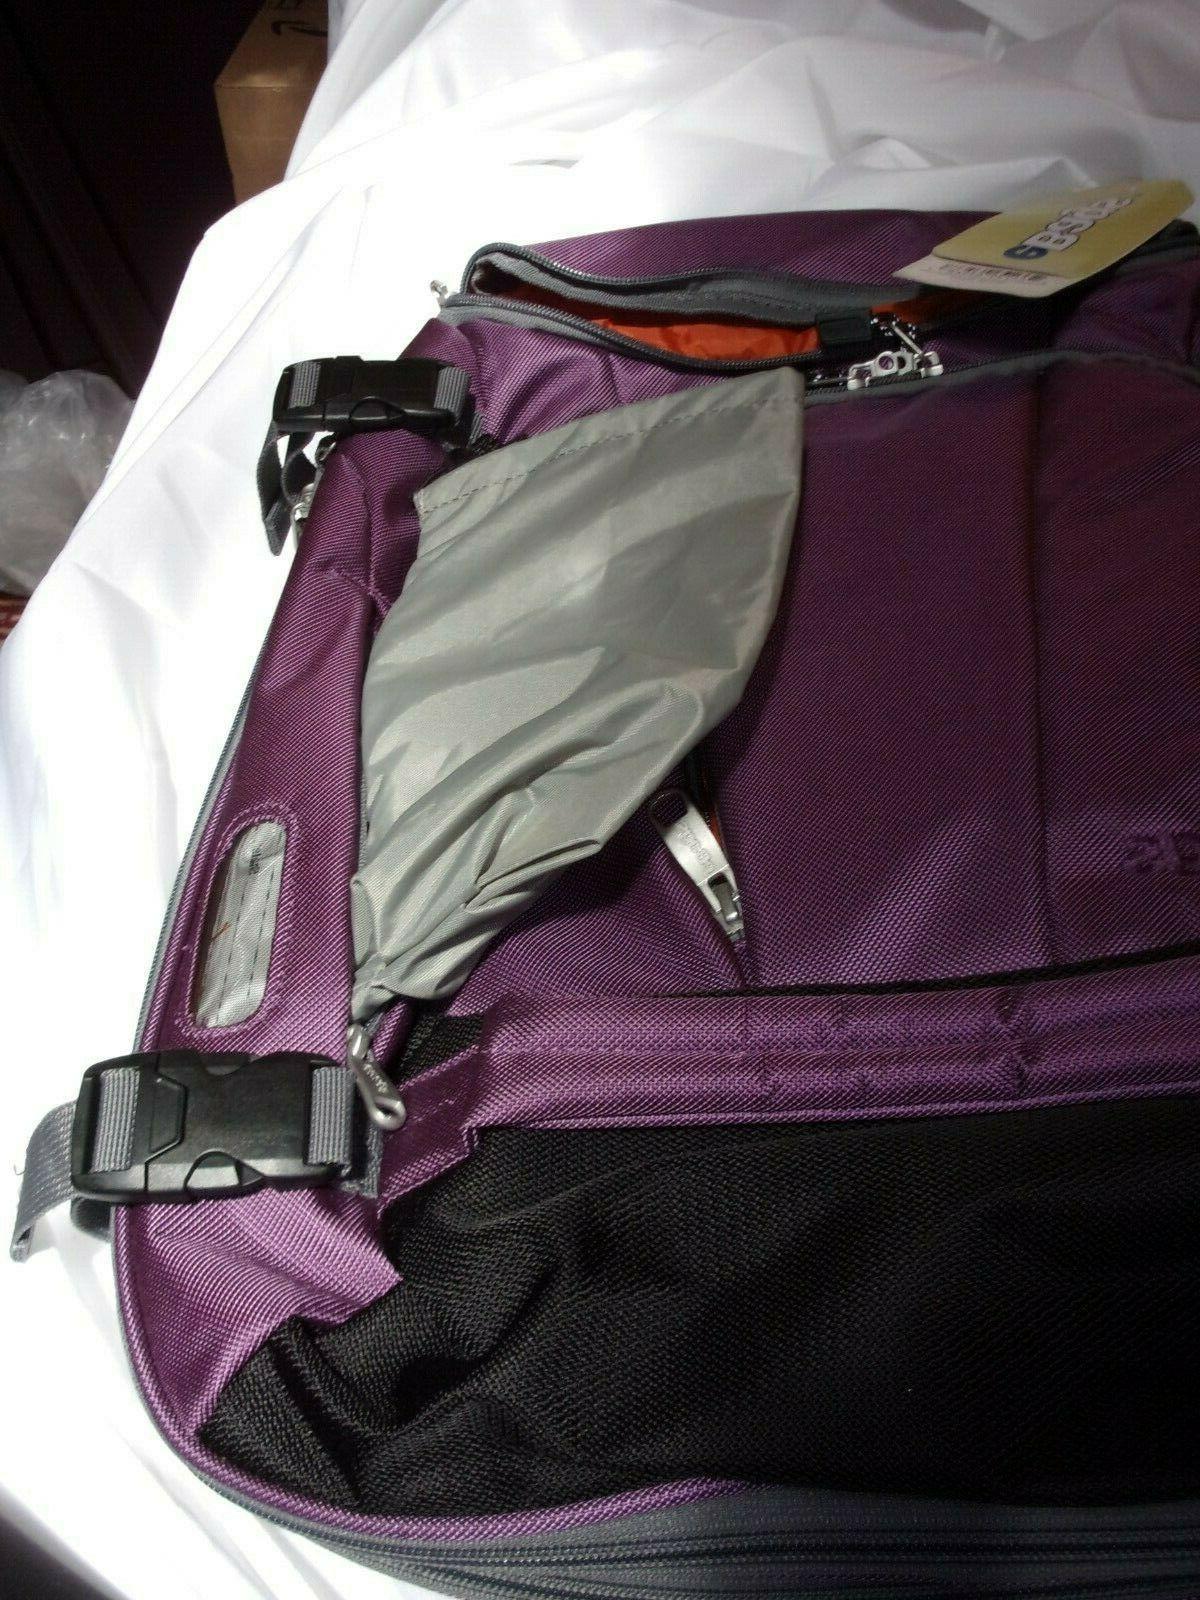 eBags Eggplant laptop daypack bagpack NWT $60